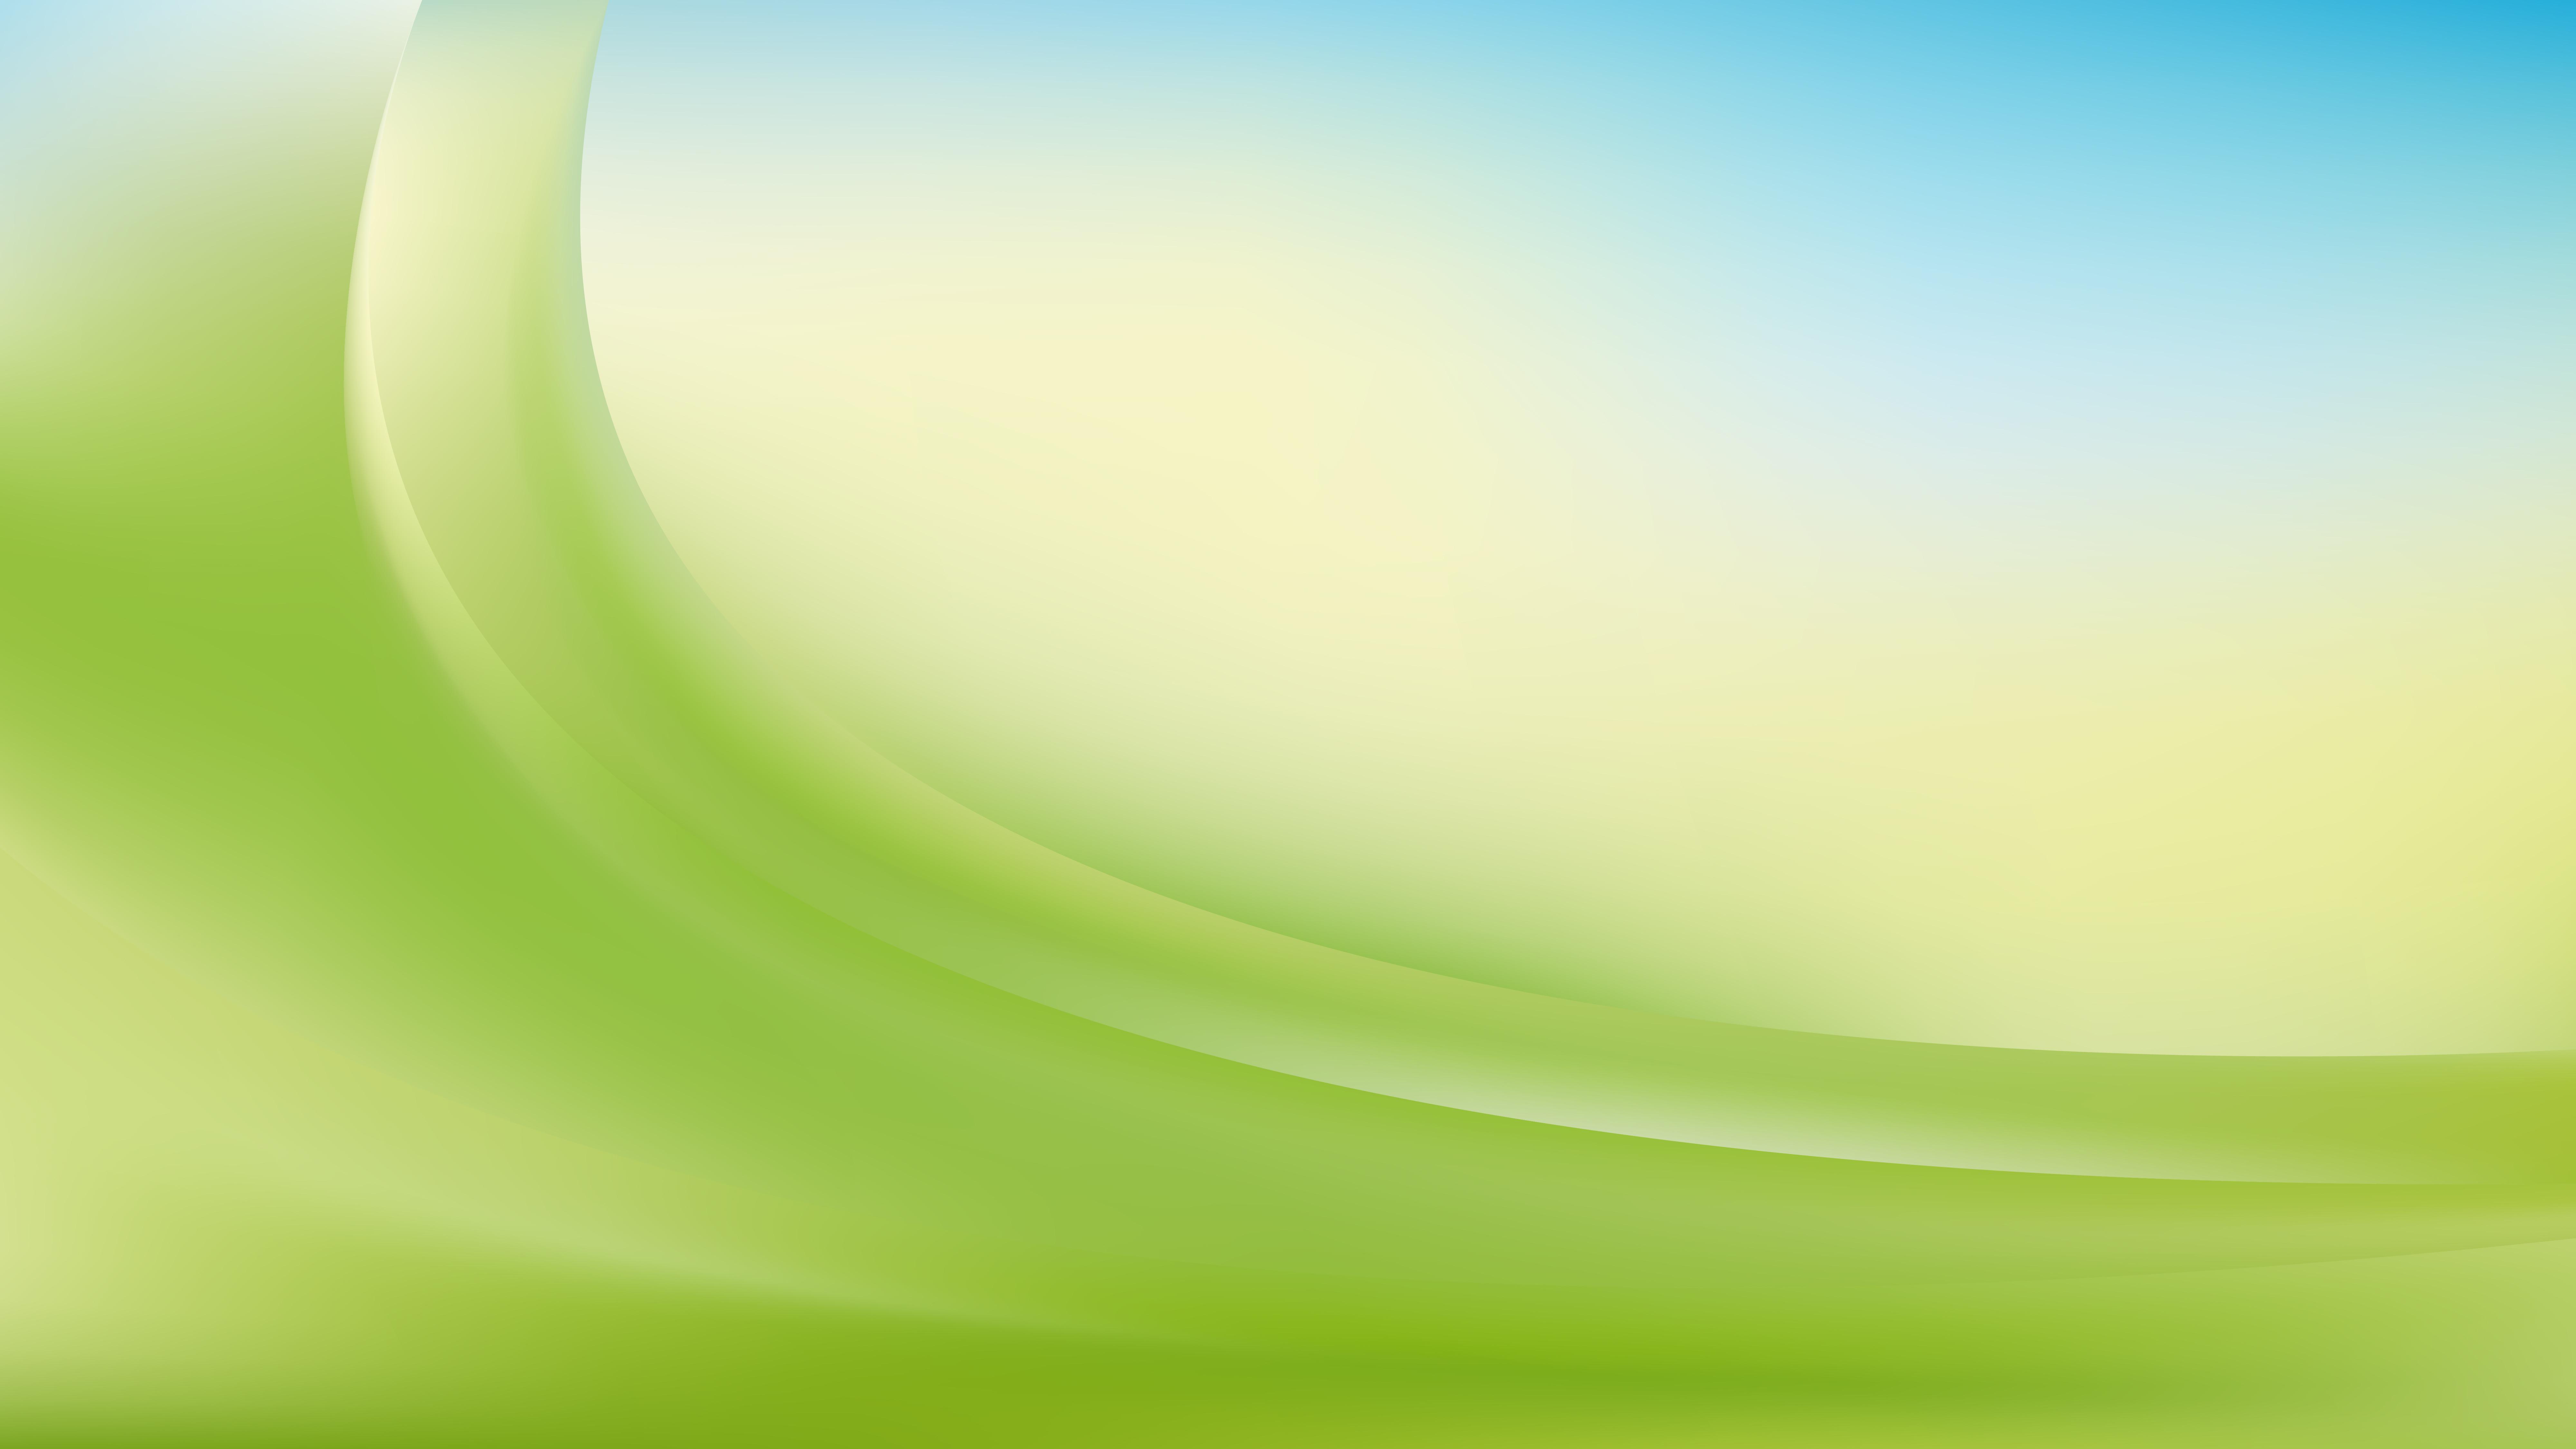 Download 84+ Background Blue Green And White Gratis Terbaru